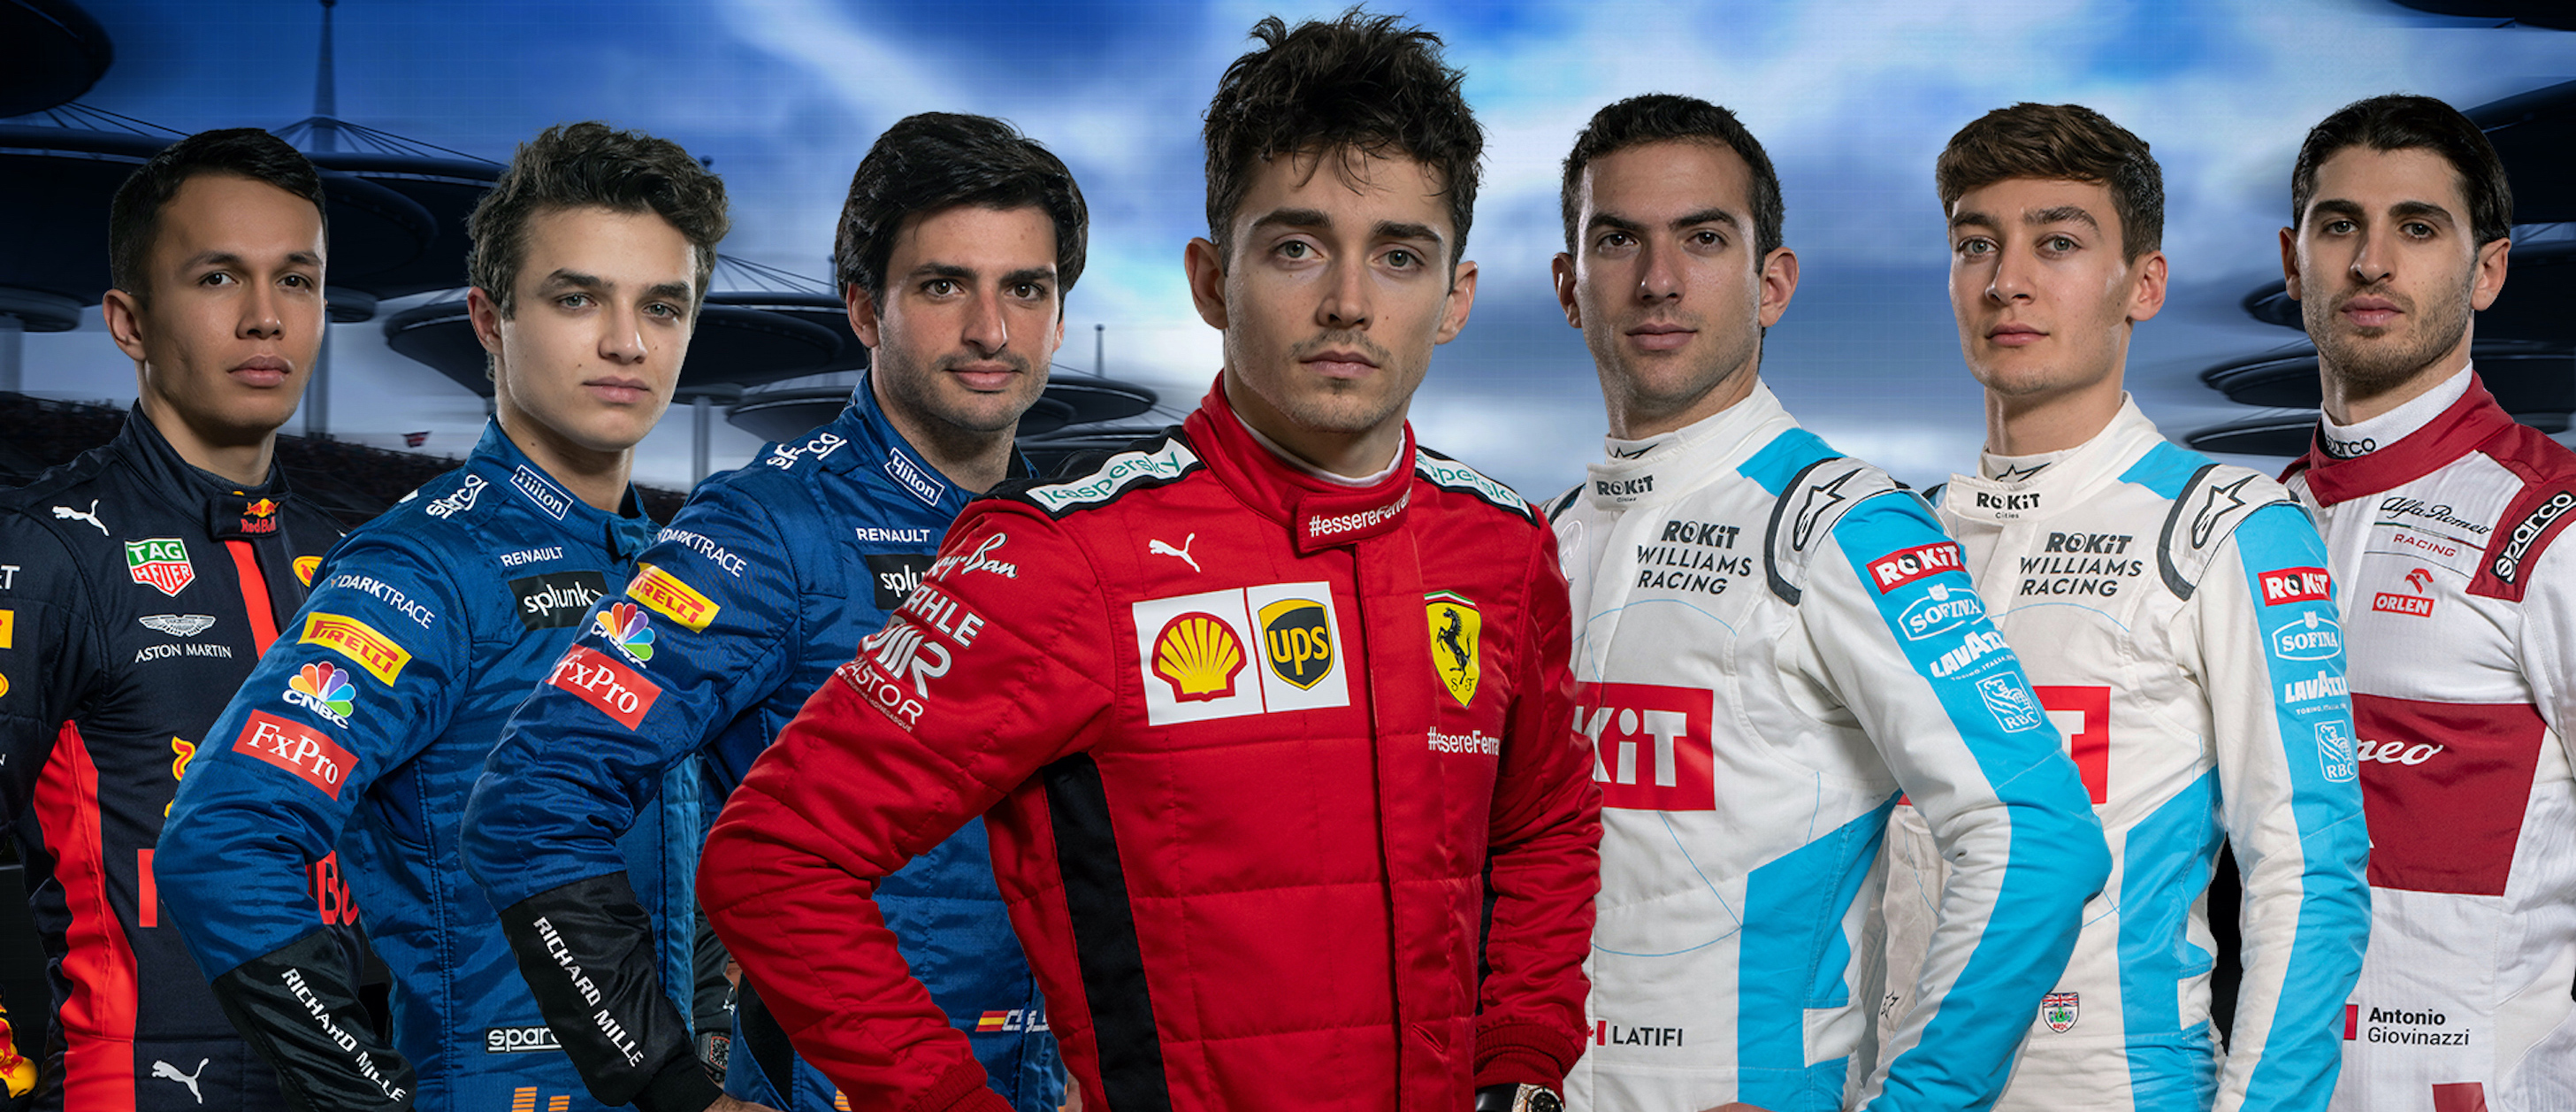 Virtual Grand Prix Series Best Bits